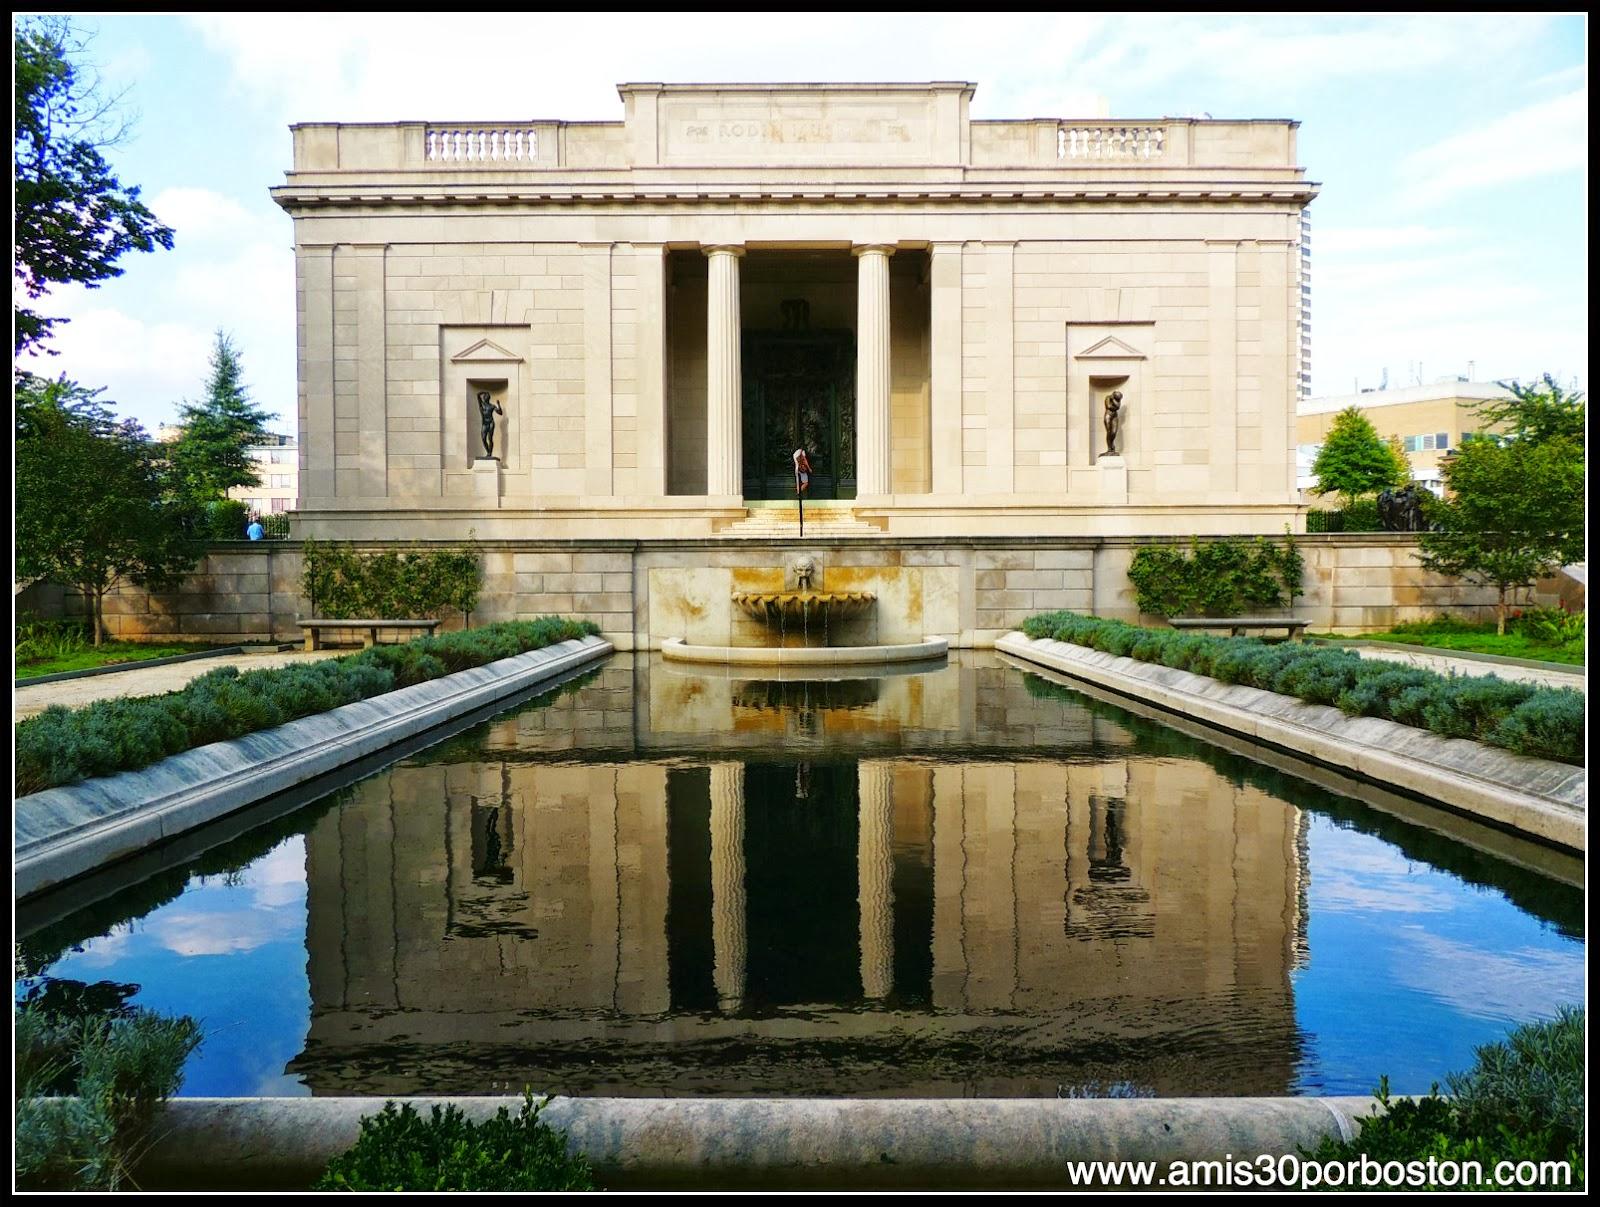 Filadelfia: Museo Rodin